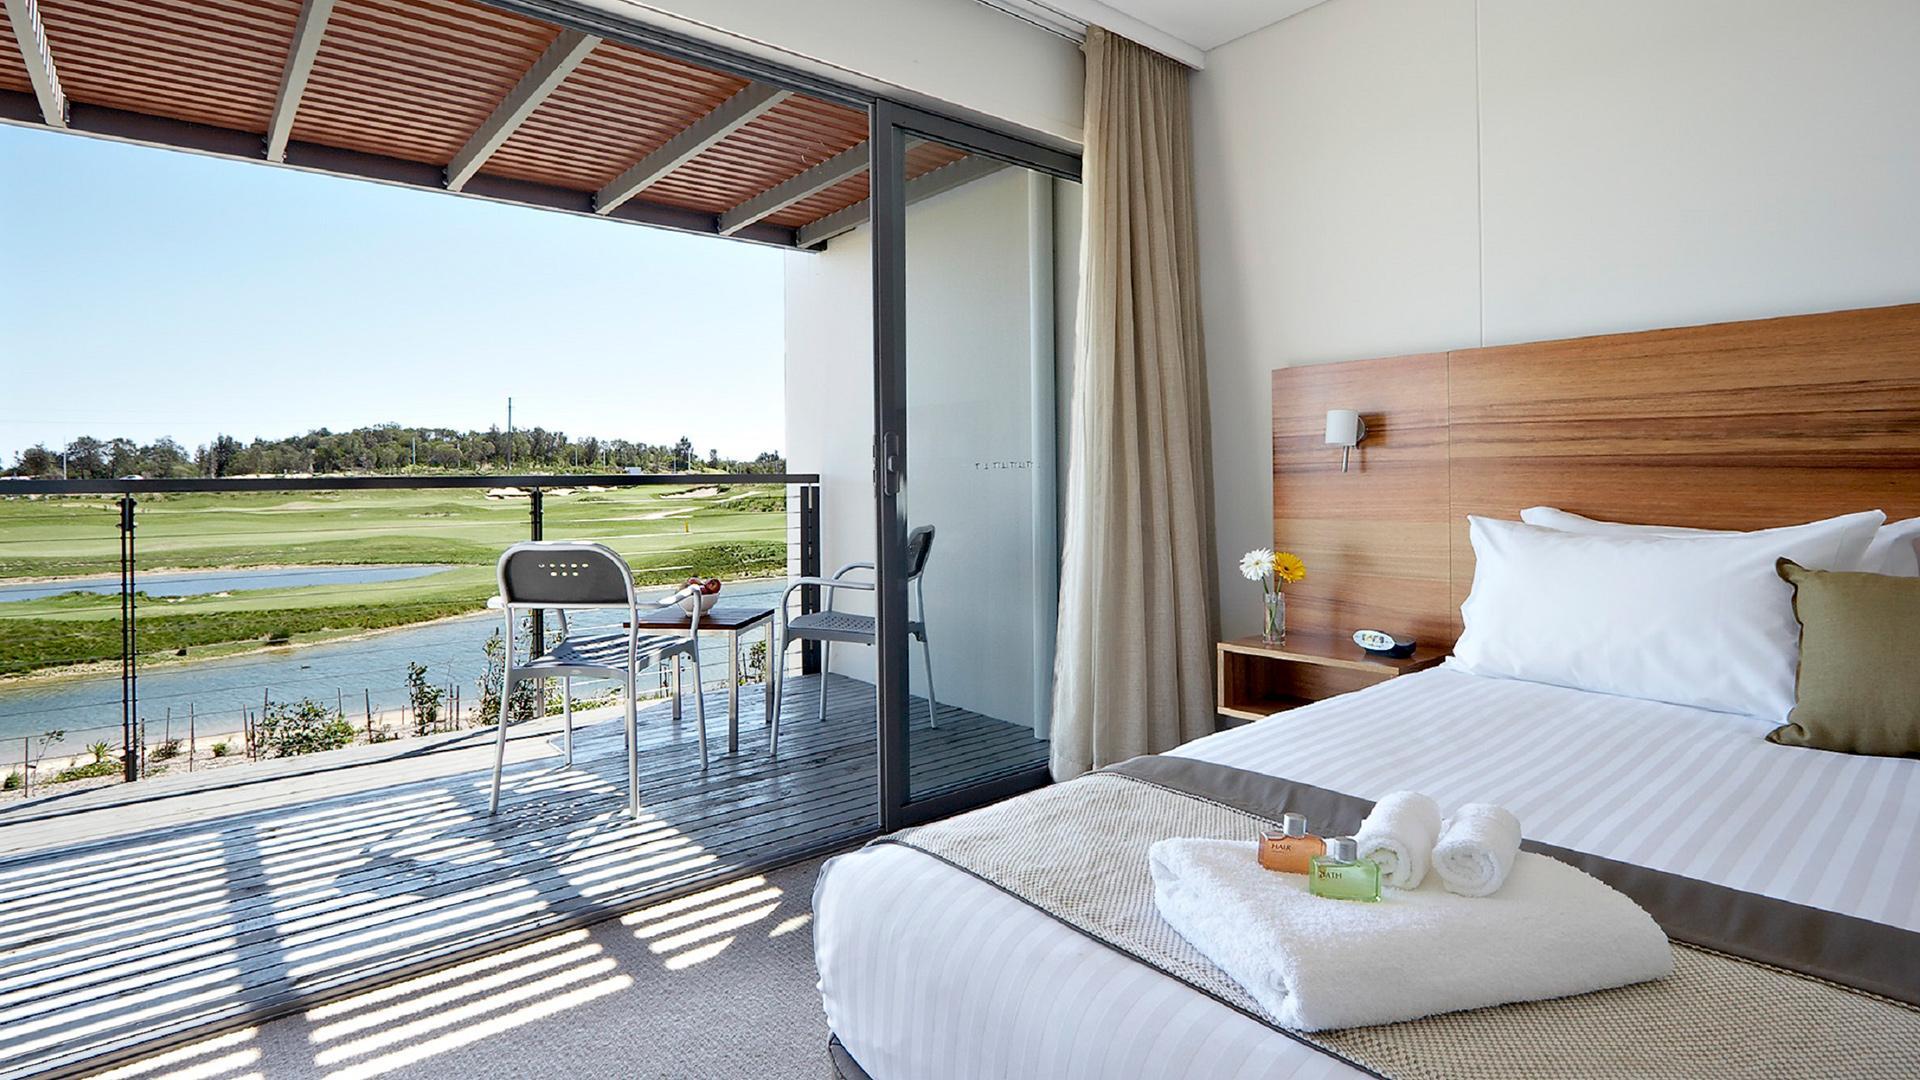 Studio Guestroom image 1 at Pullman Magenta Shores Resort by Wyong Shire Council, New South Wales, Australia